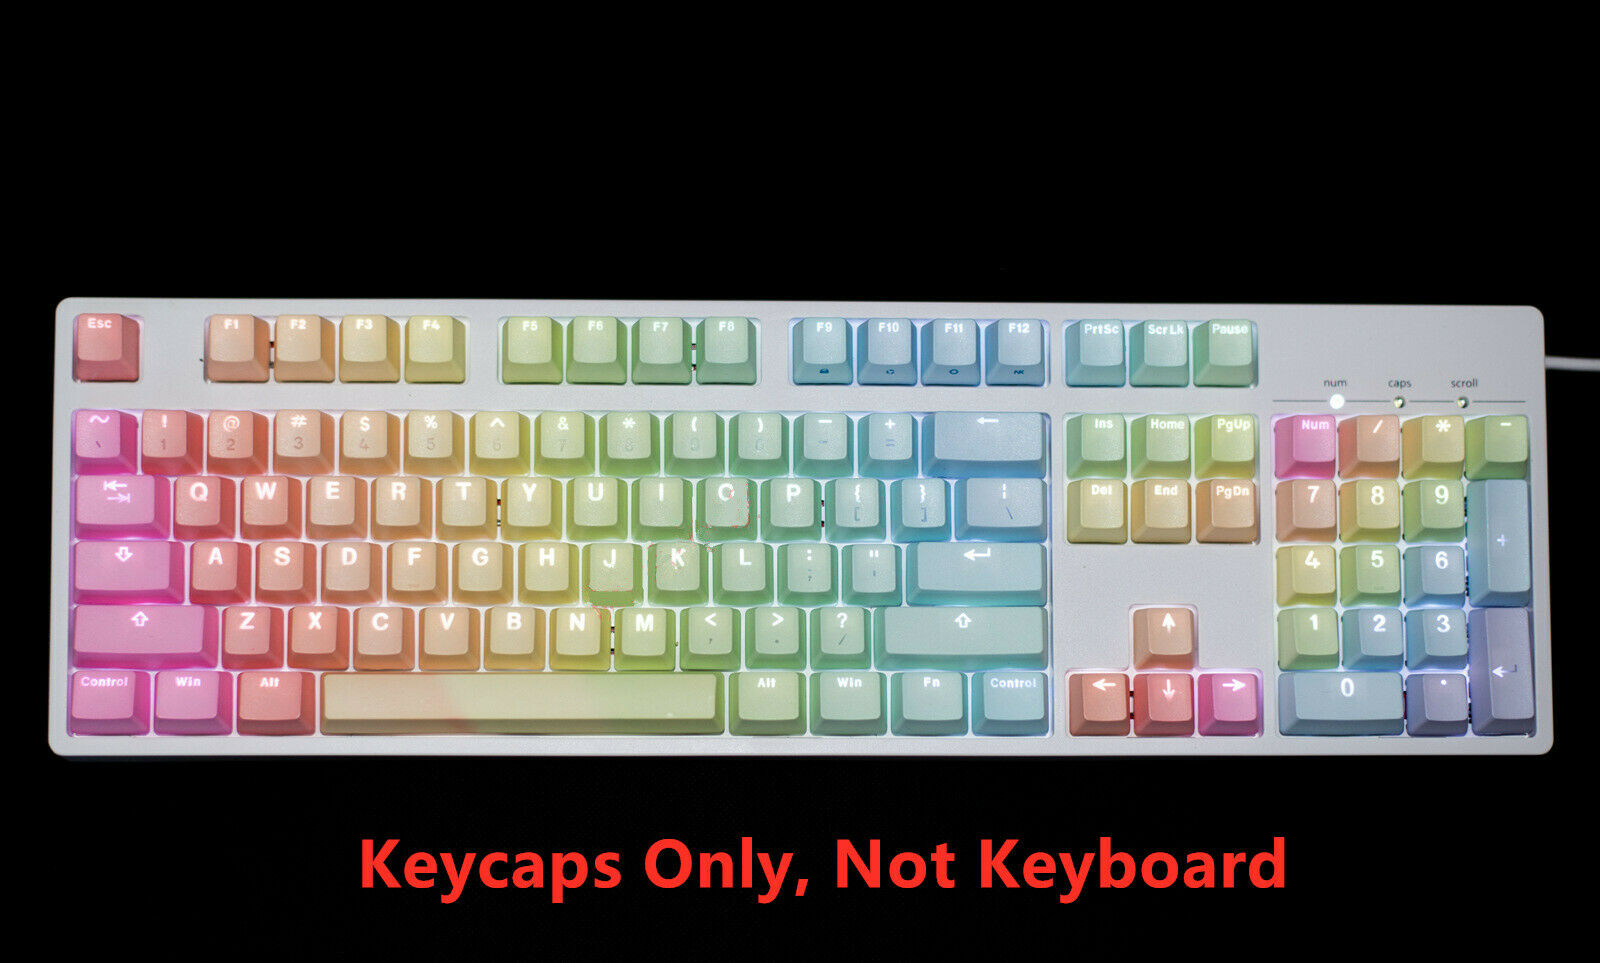 Keyboard keycaps Mechanical Keyboard Keycaps Rainbow PBT Game Keyboard Keycap Multi Color 104 Keycap Use ANSI Color : 104 Keys top Print